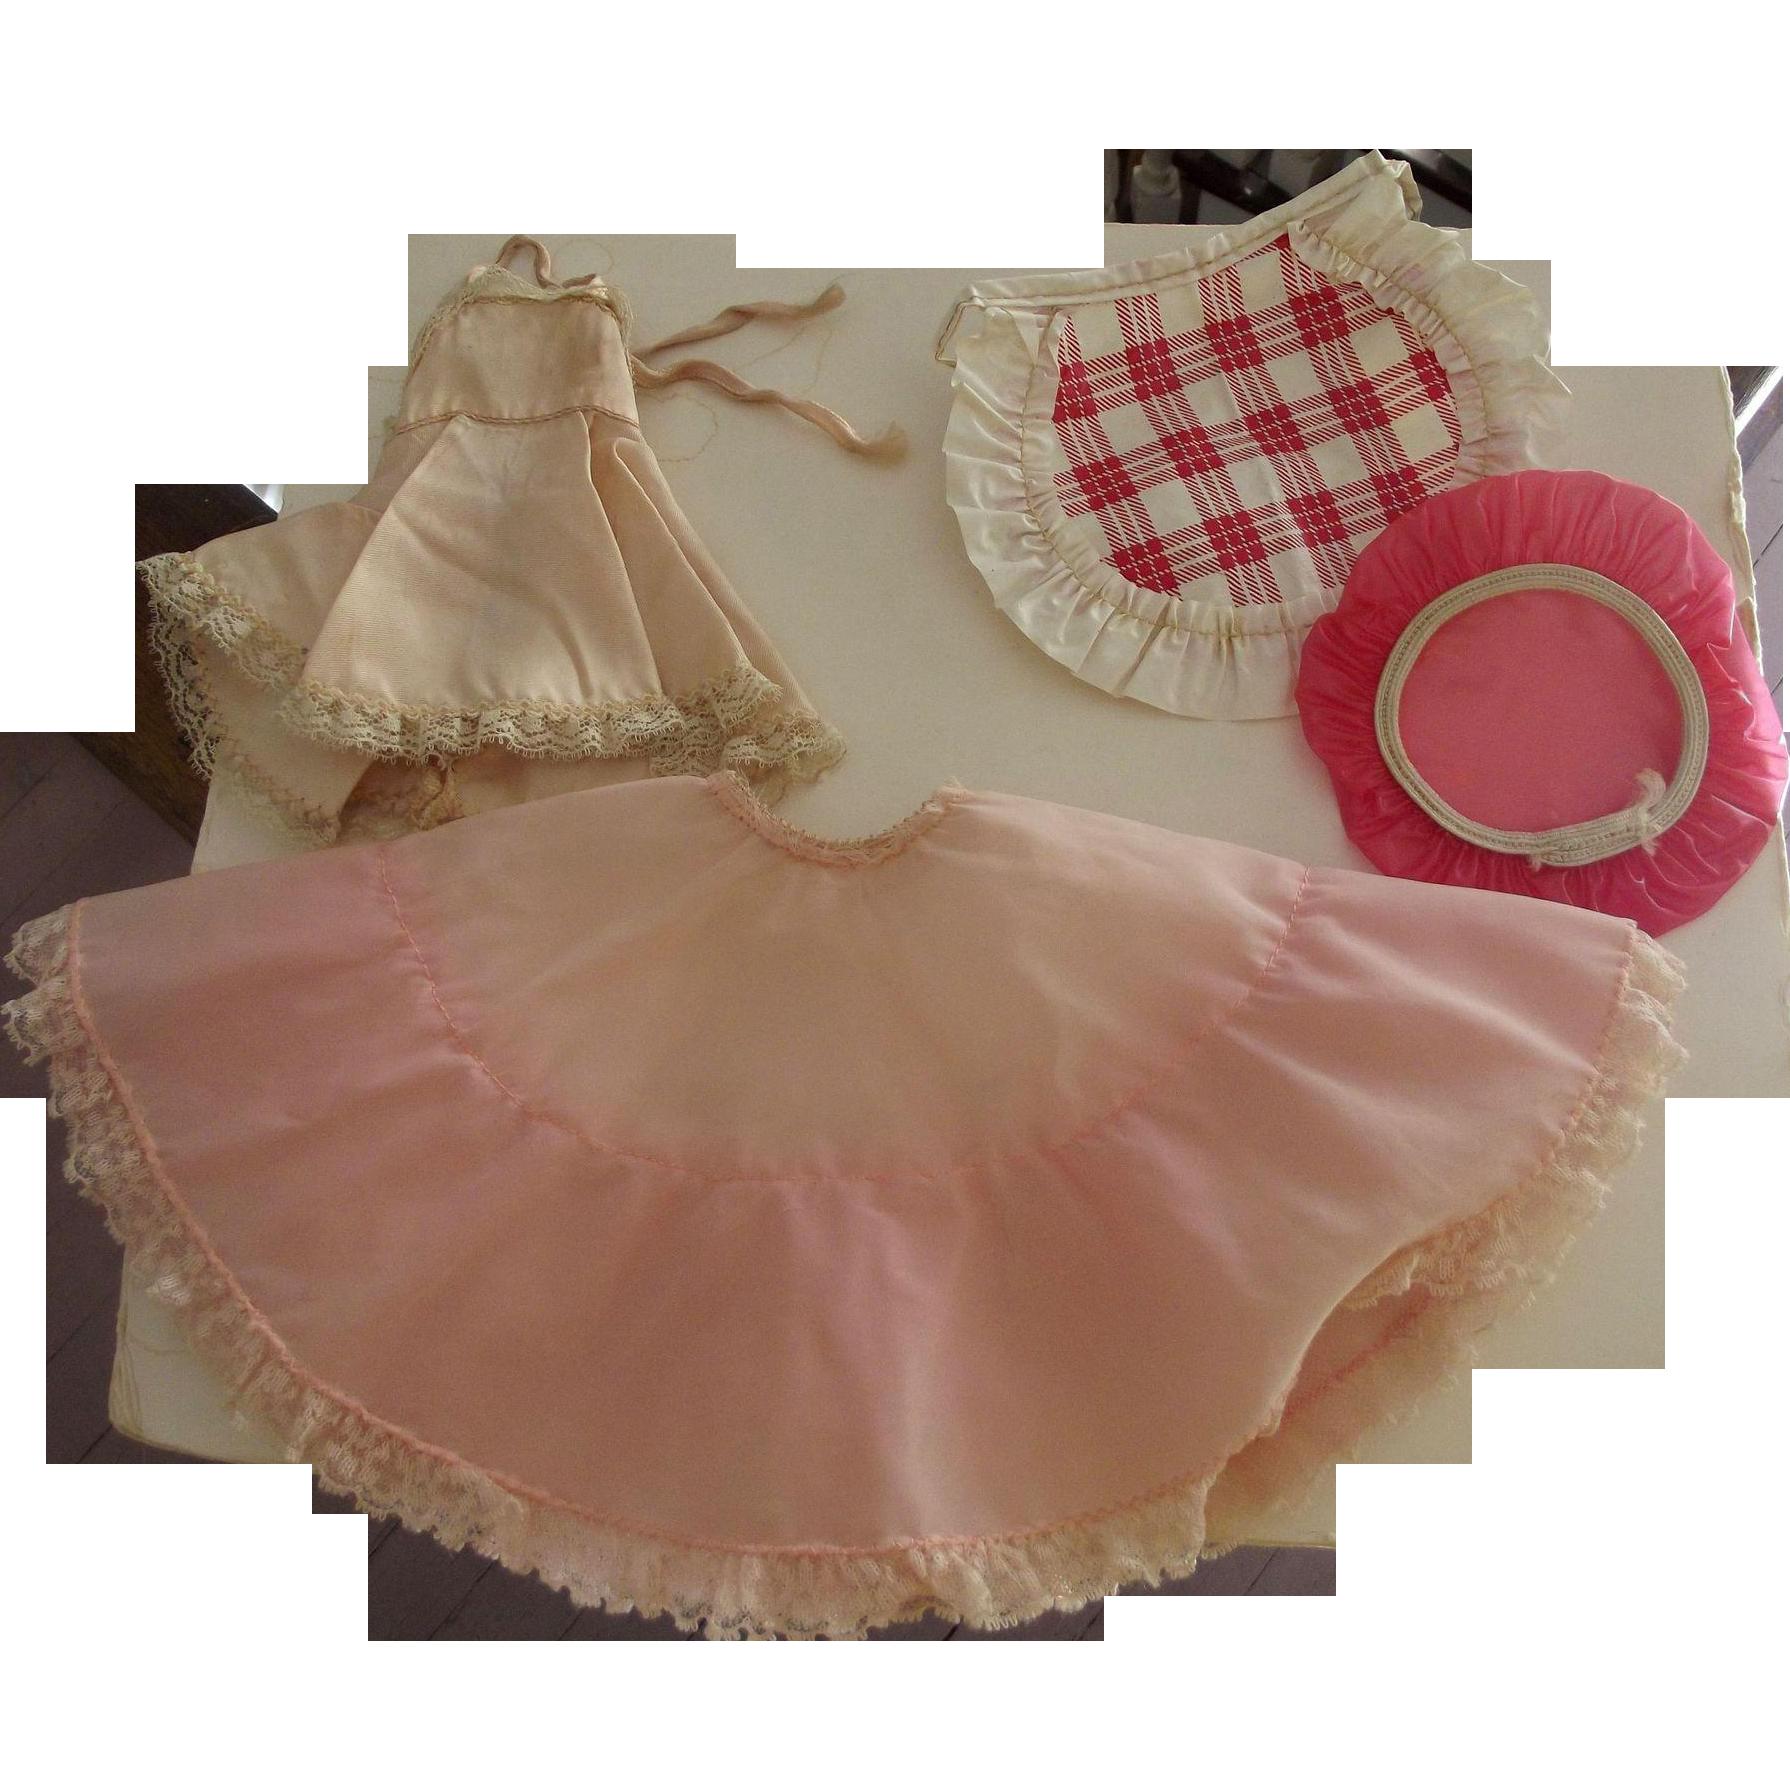 Doll Shower Cap, Plastic Apron, Crinoline and Shirley Temple Slip